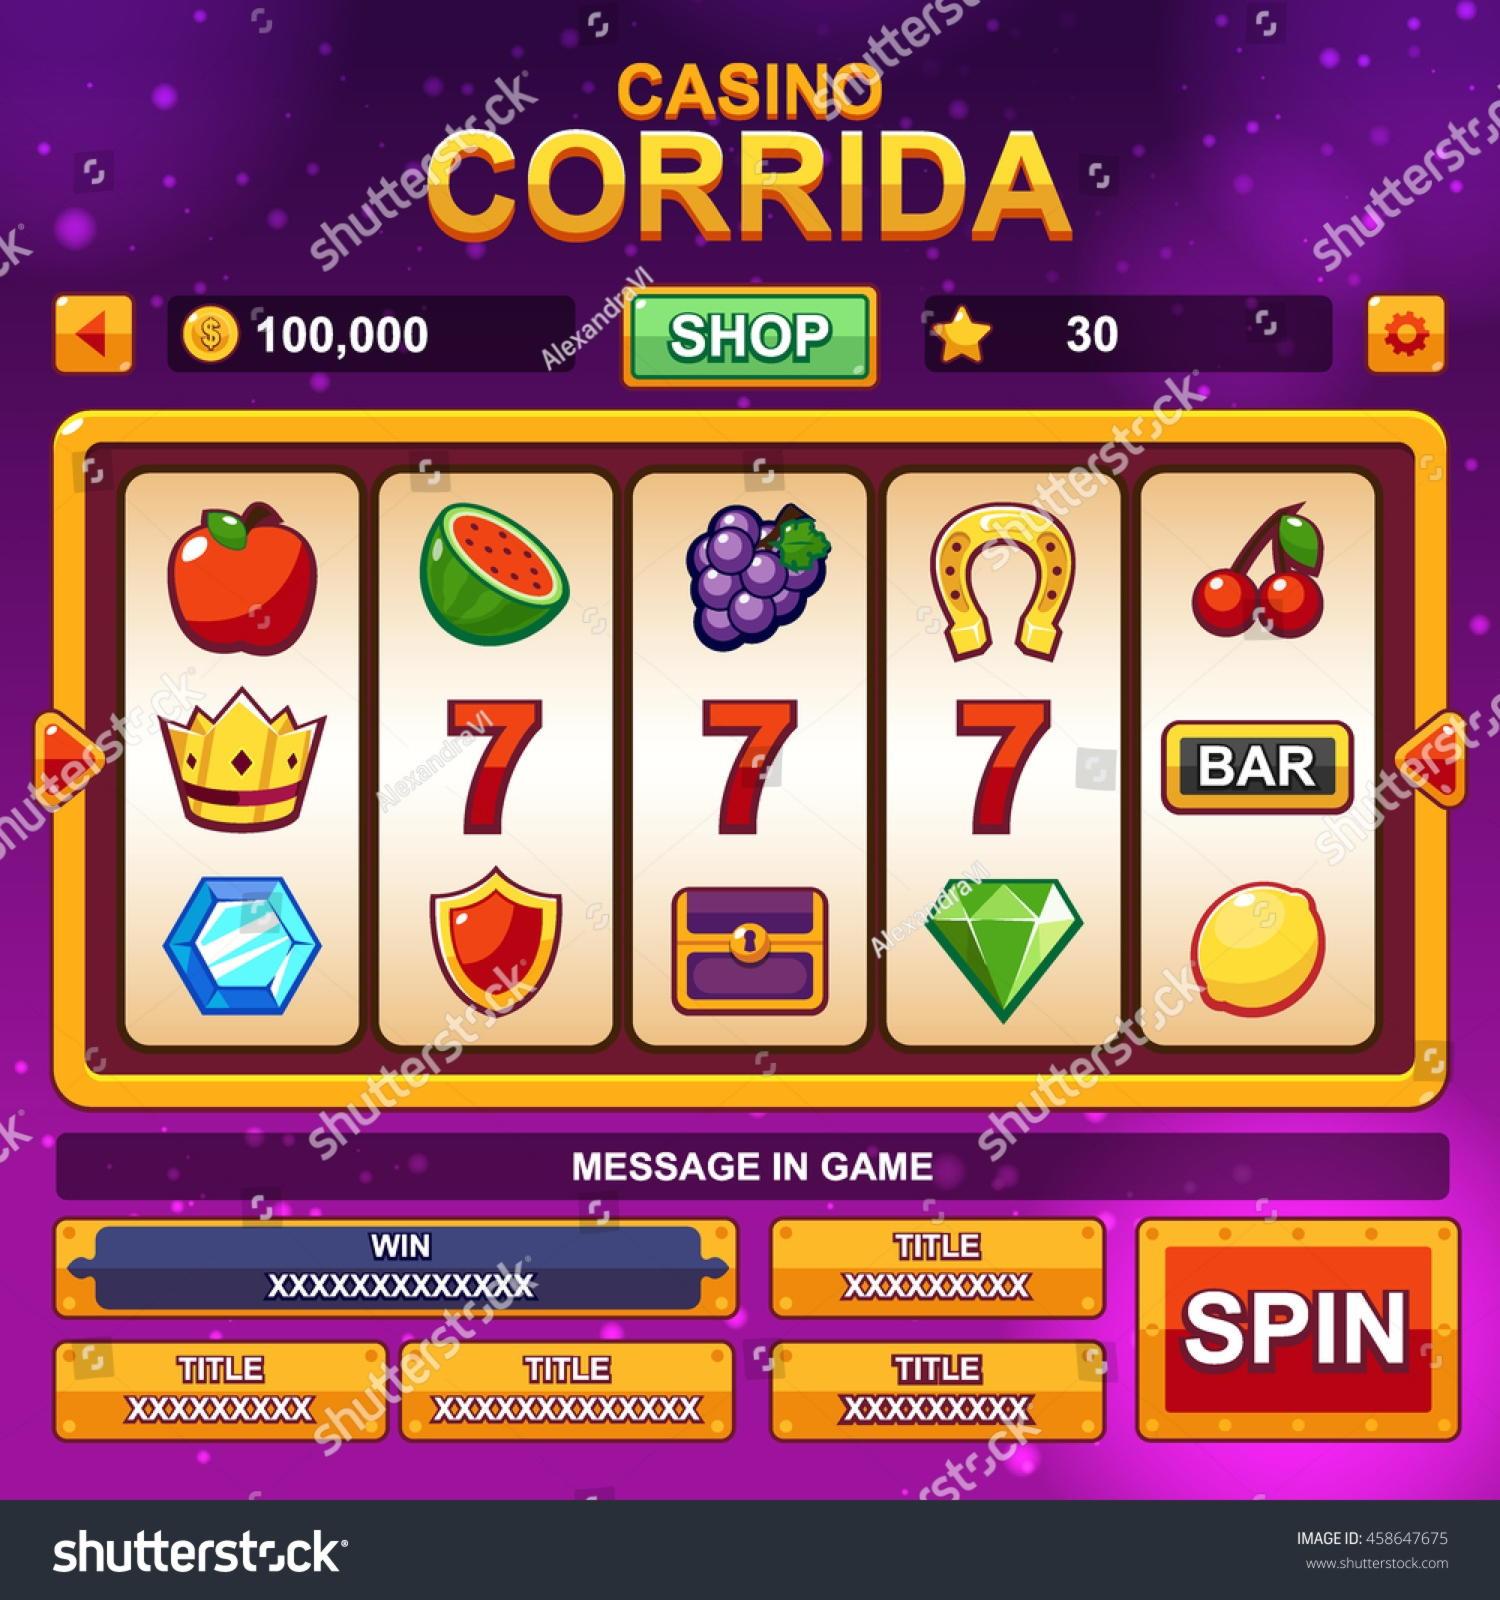 € 2845 No Deposit Bonus Casino pri Bet Motion